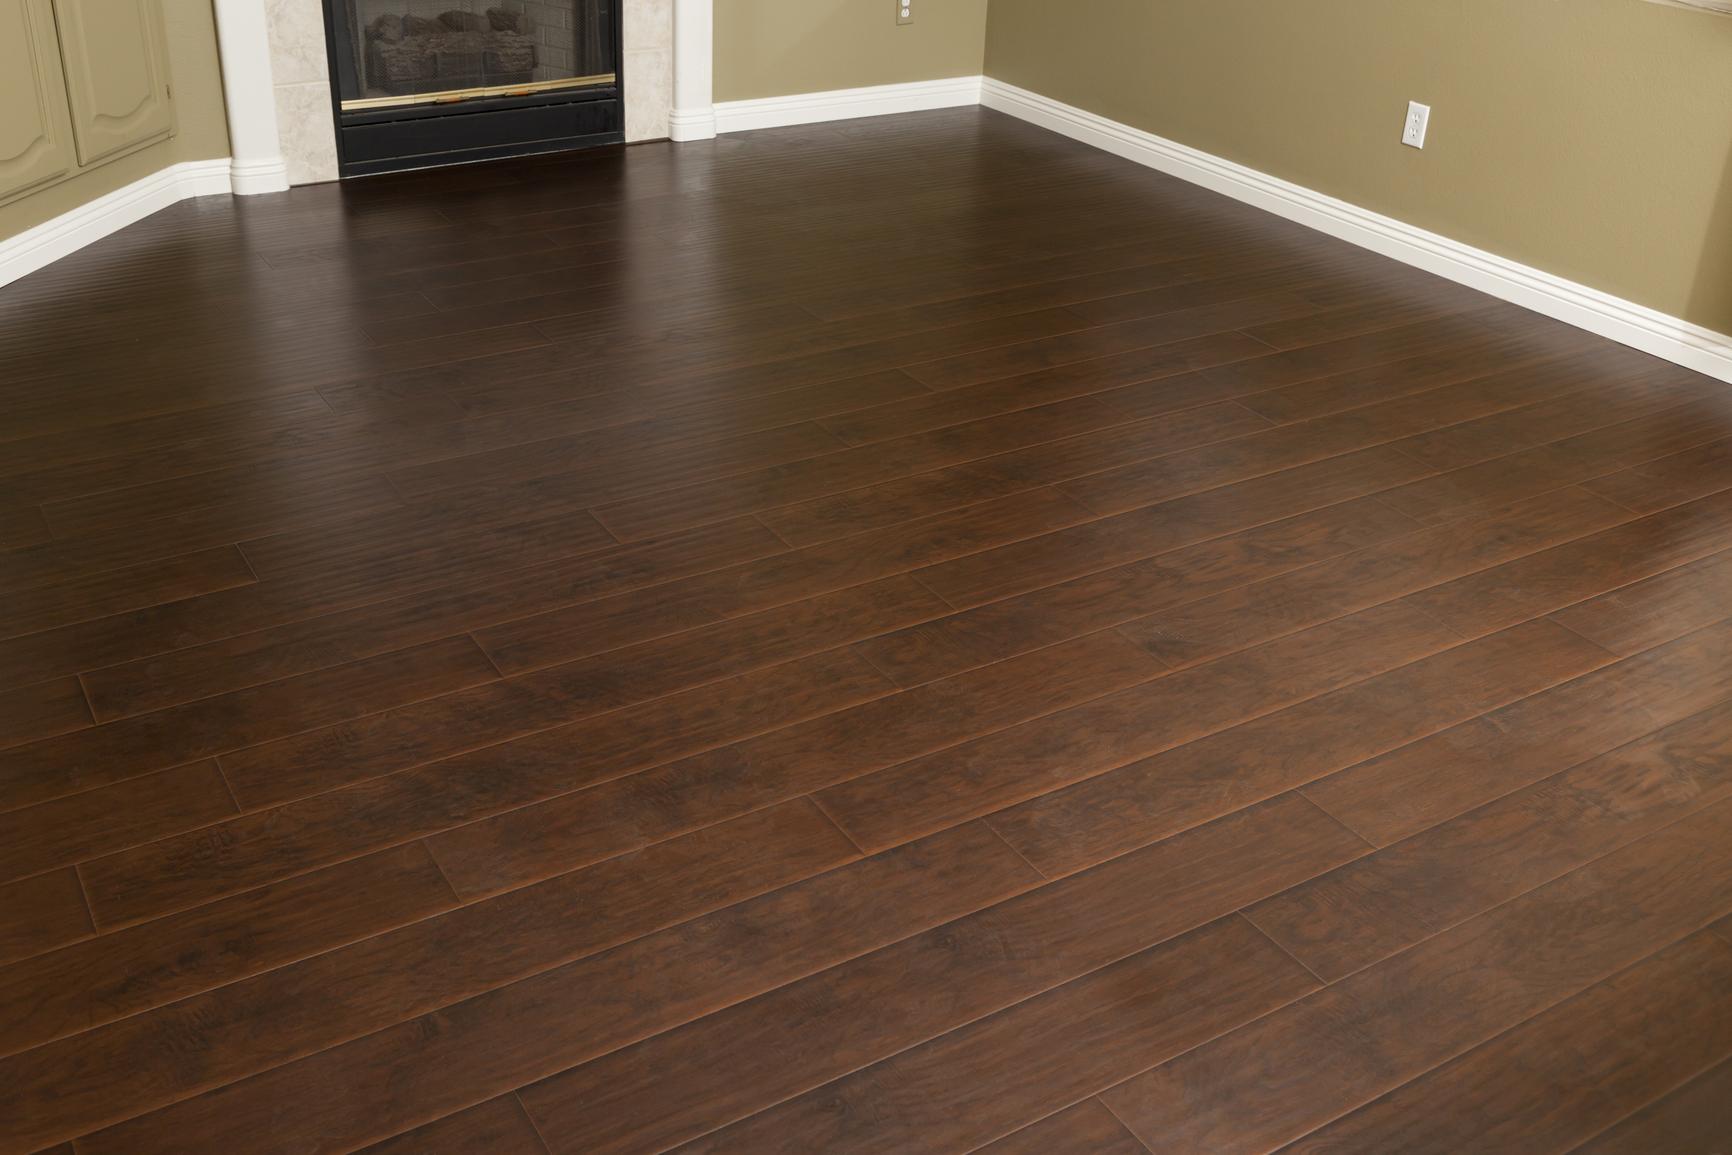 change carpet to hardwood floor cost ideas pictures tips